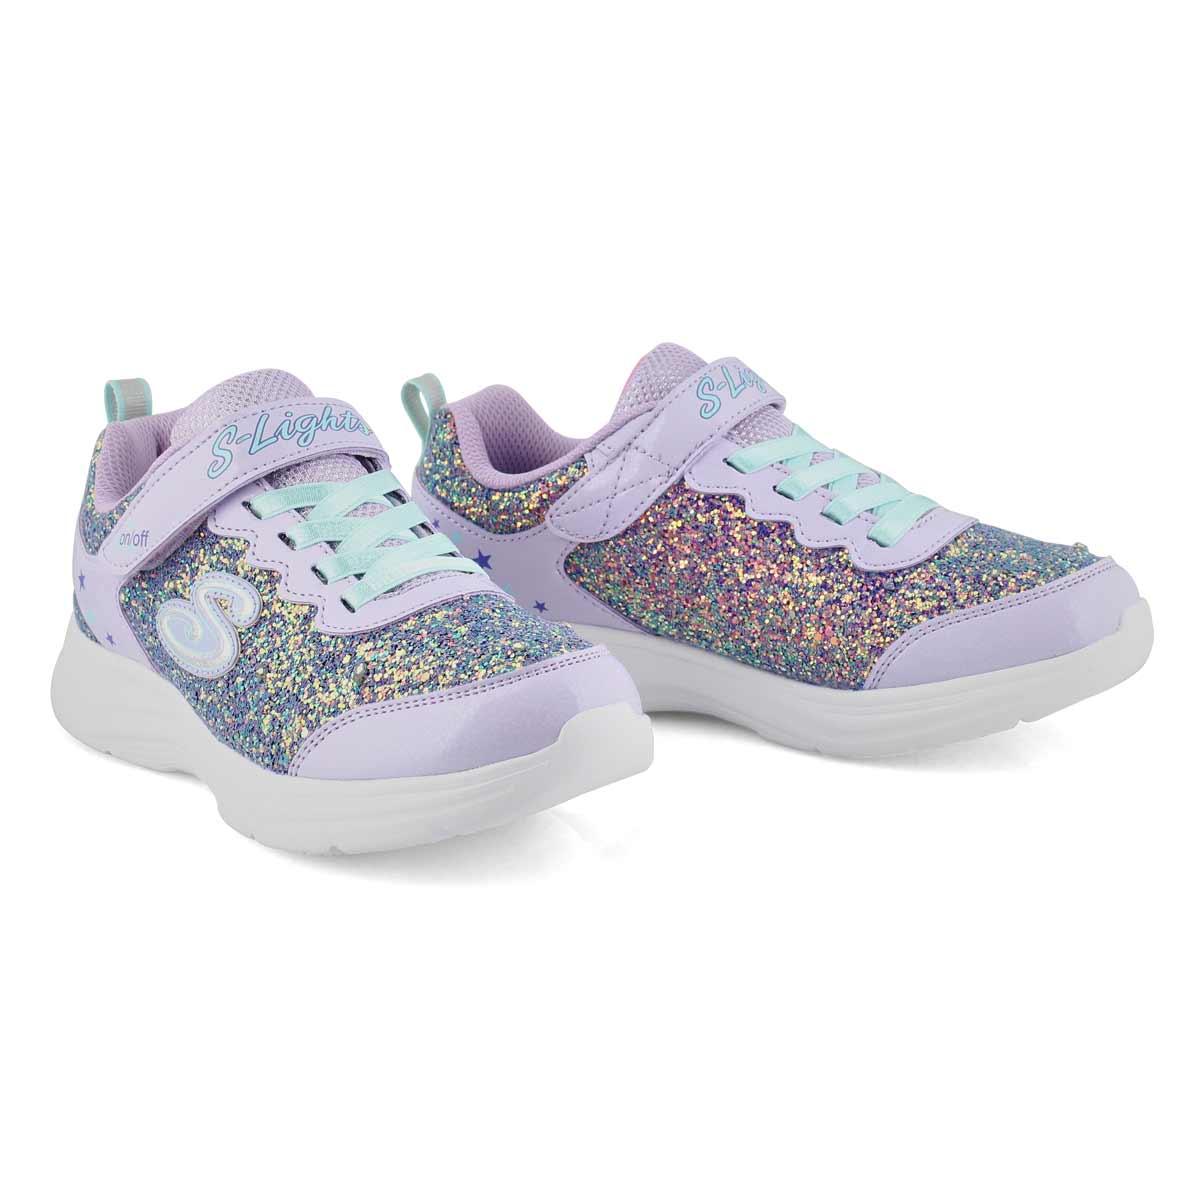 Grls Glimmer Kicks lavender sneaker